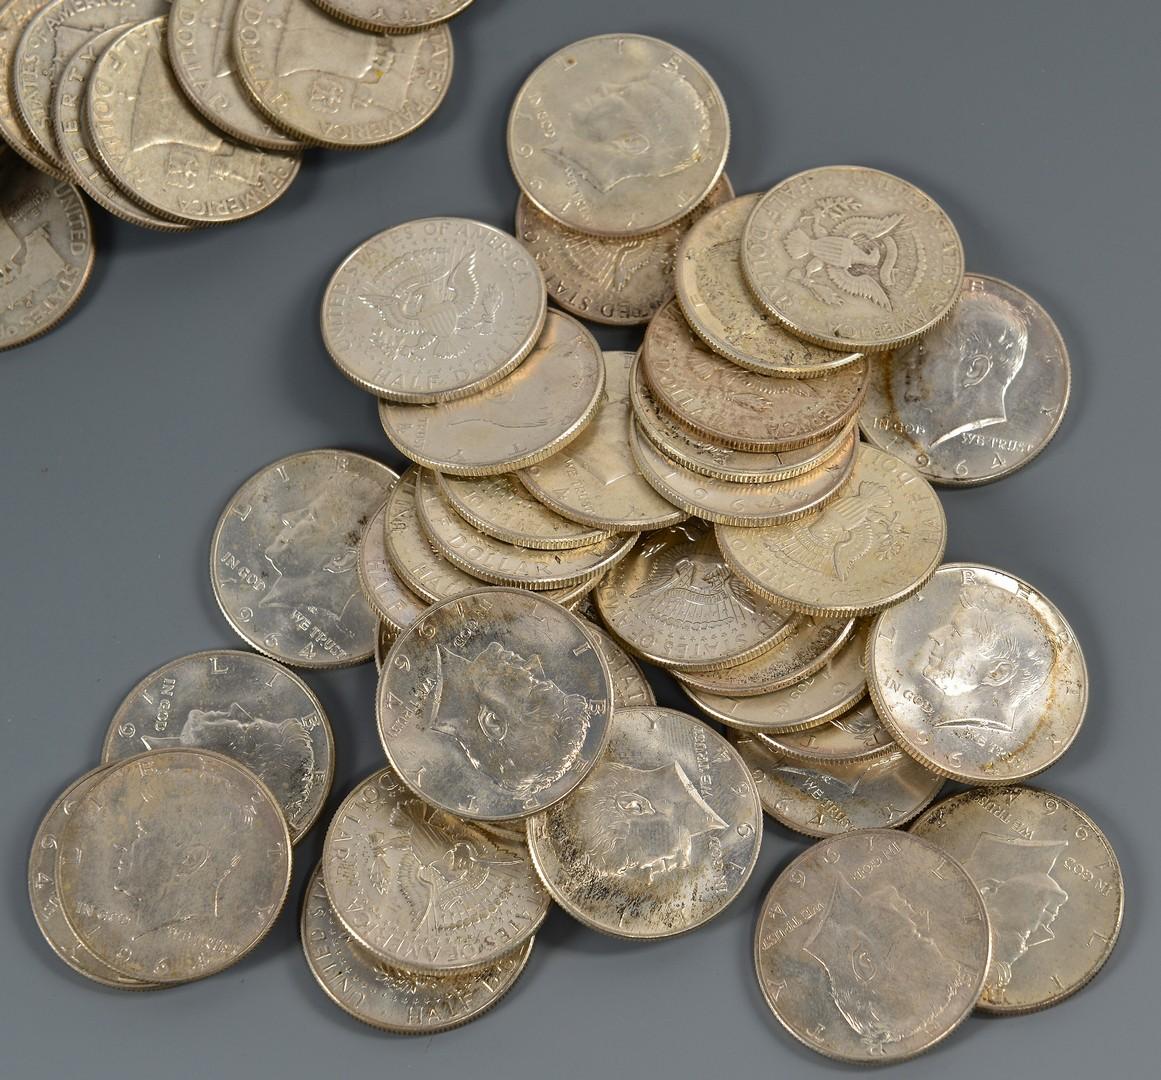 Lot 898: 207 U. S. Silver Half-dollars